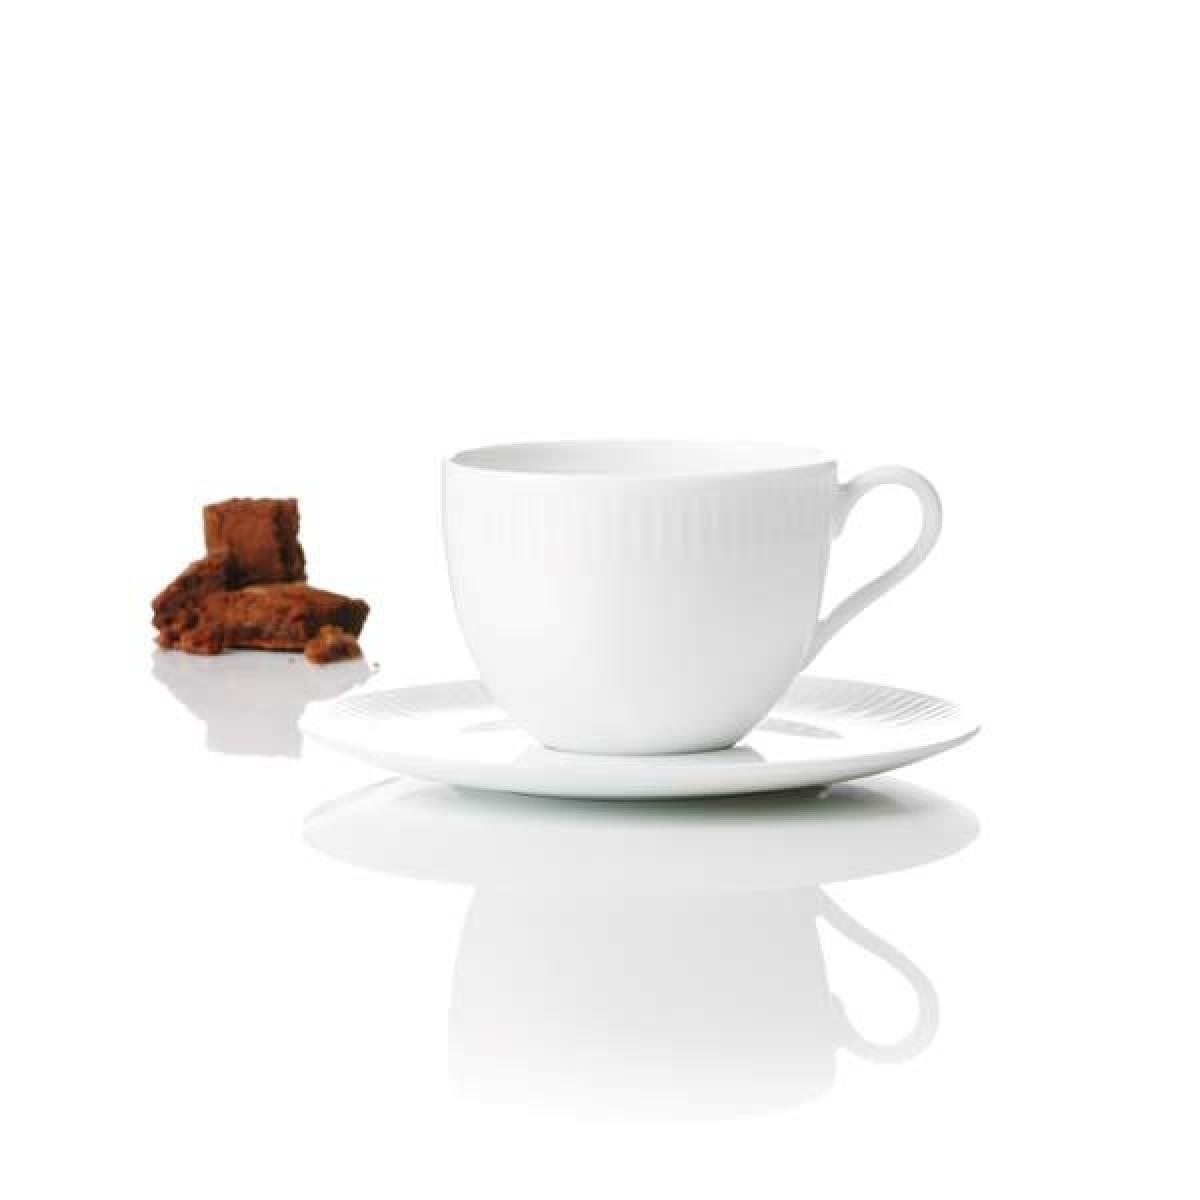 AIDA Relief kaffekop 4 stk. 20 cl.